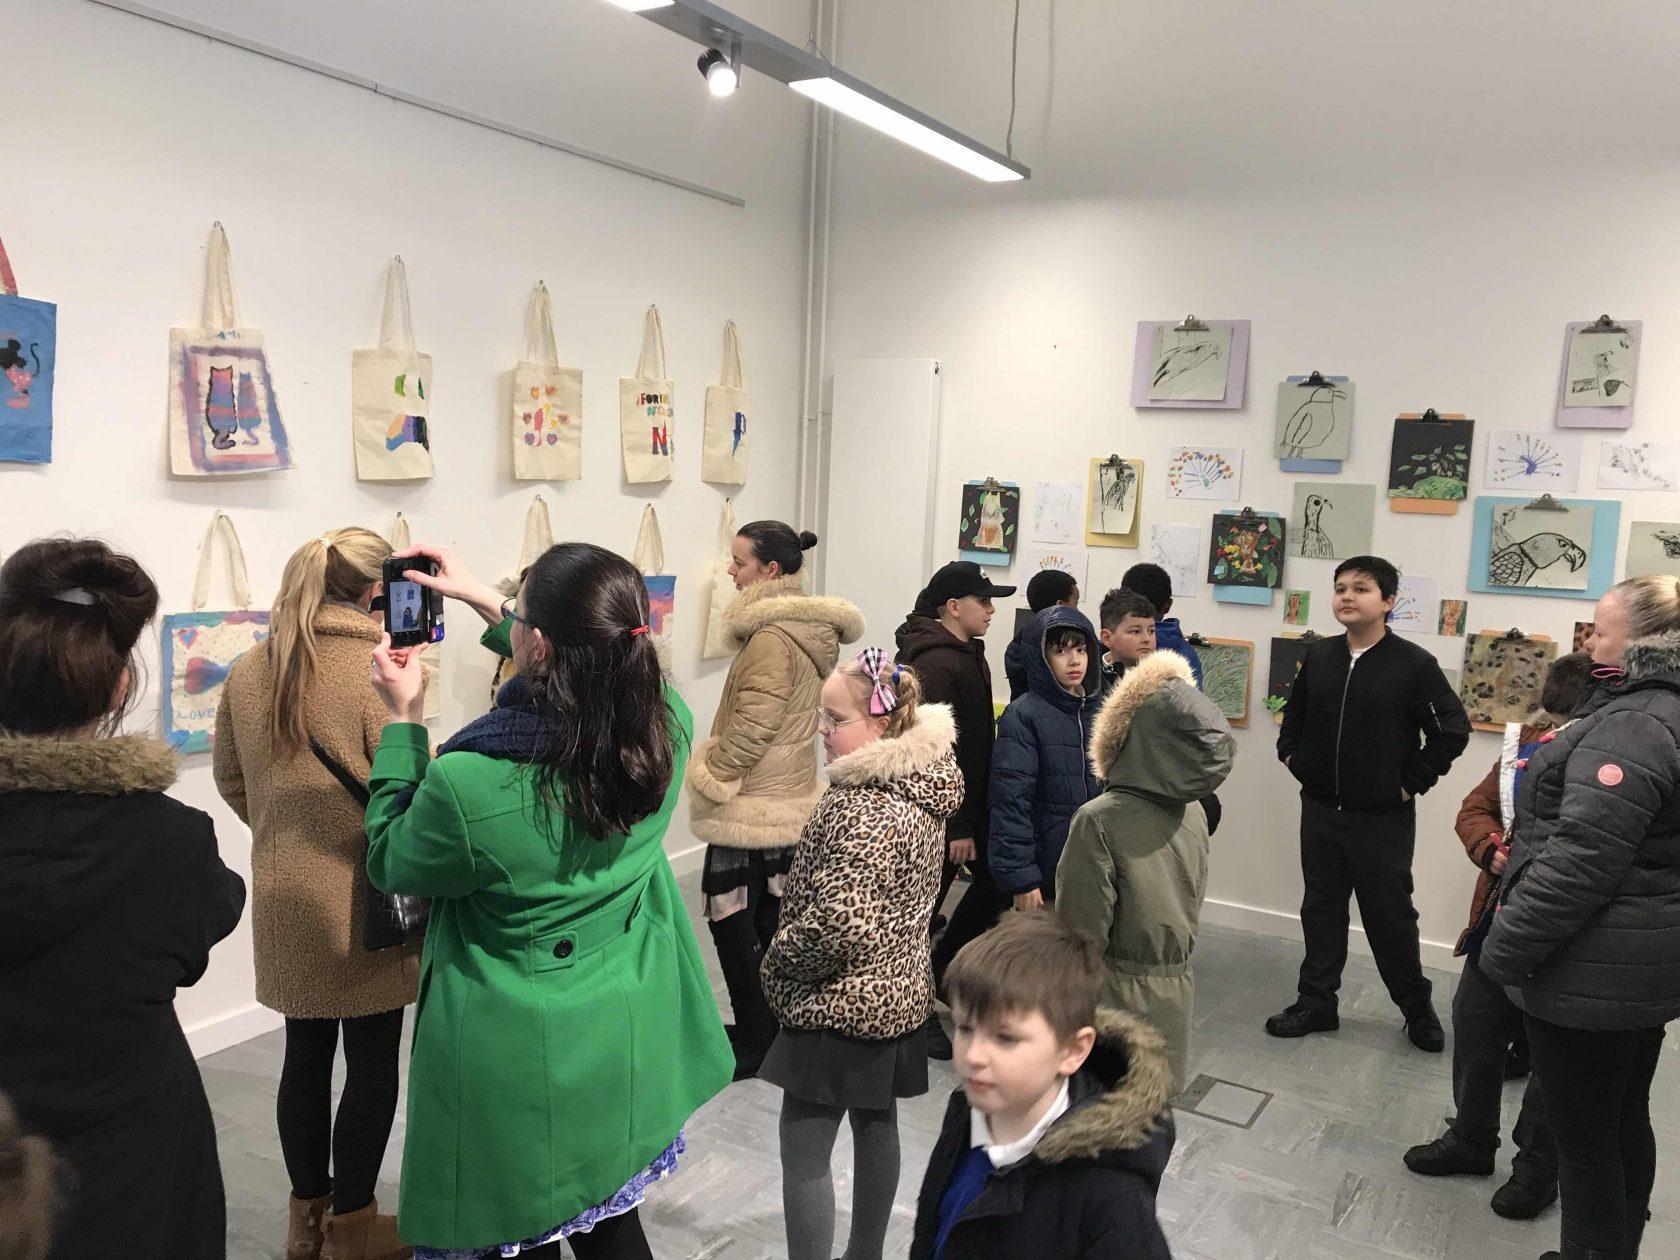 Hartsbourne and Little Reddings visit The BSJT Gallery